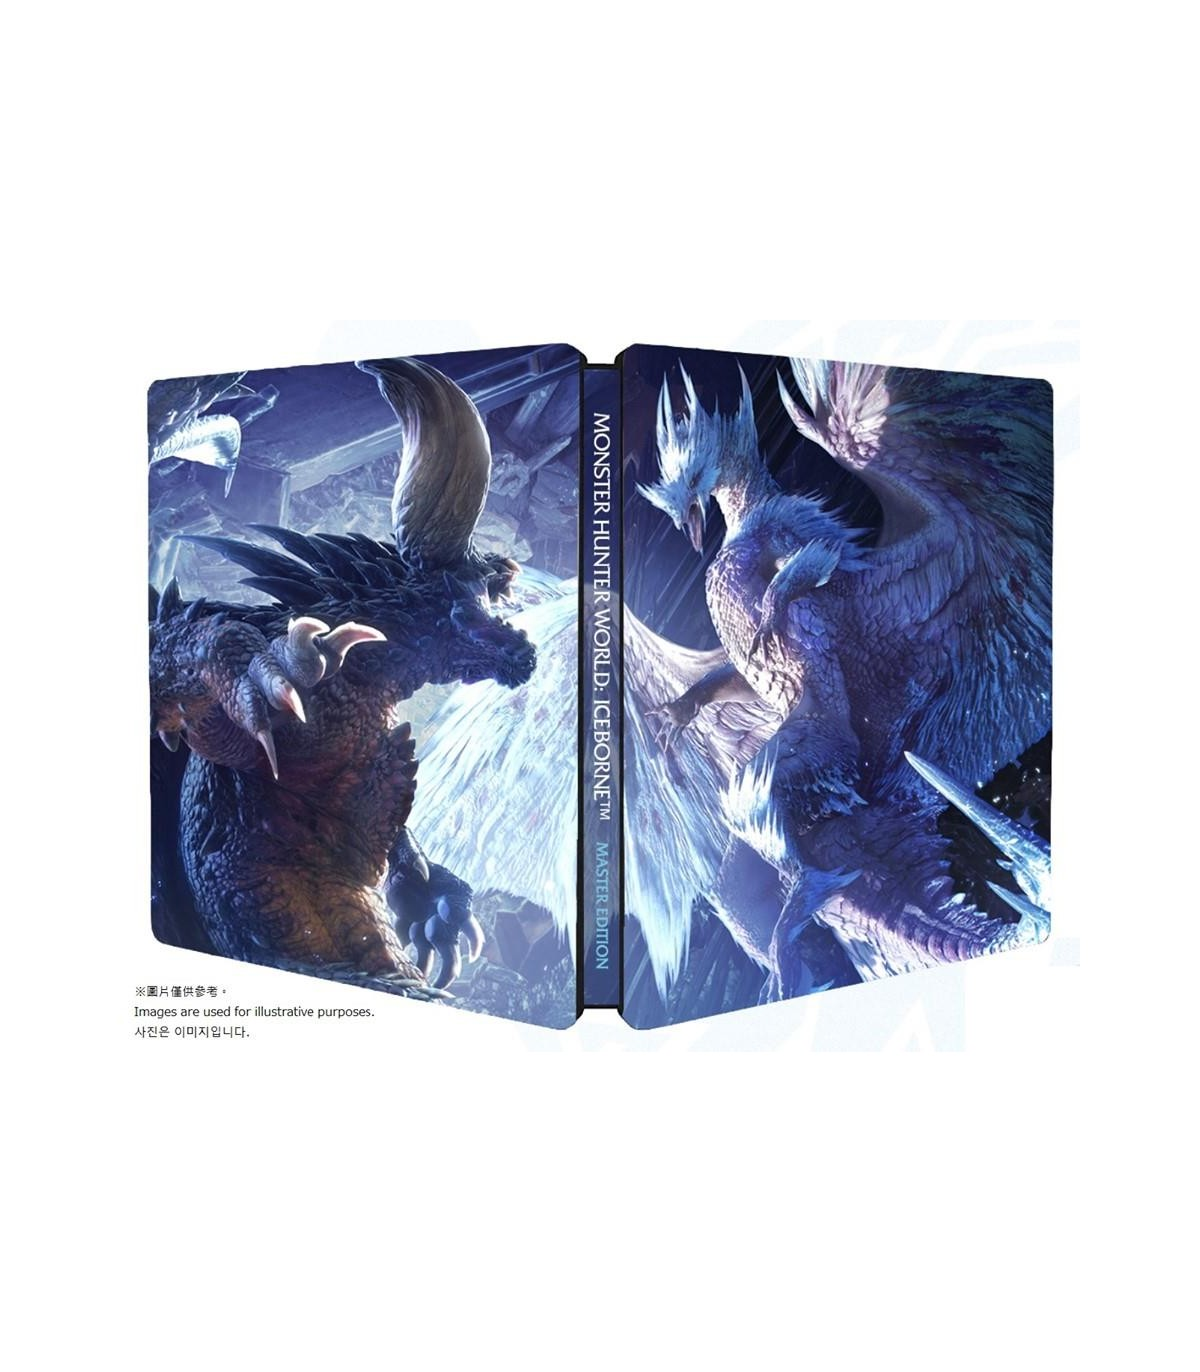 بازی Monster Hunter World: Iceborne - پلی استیشن 4